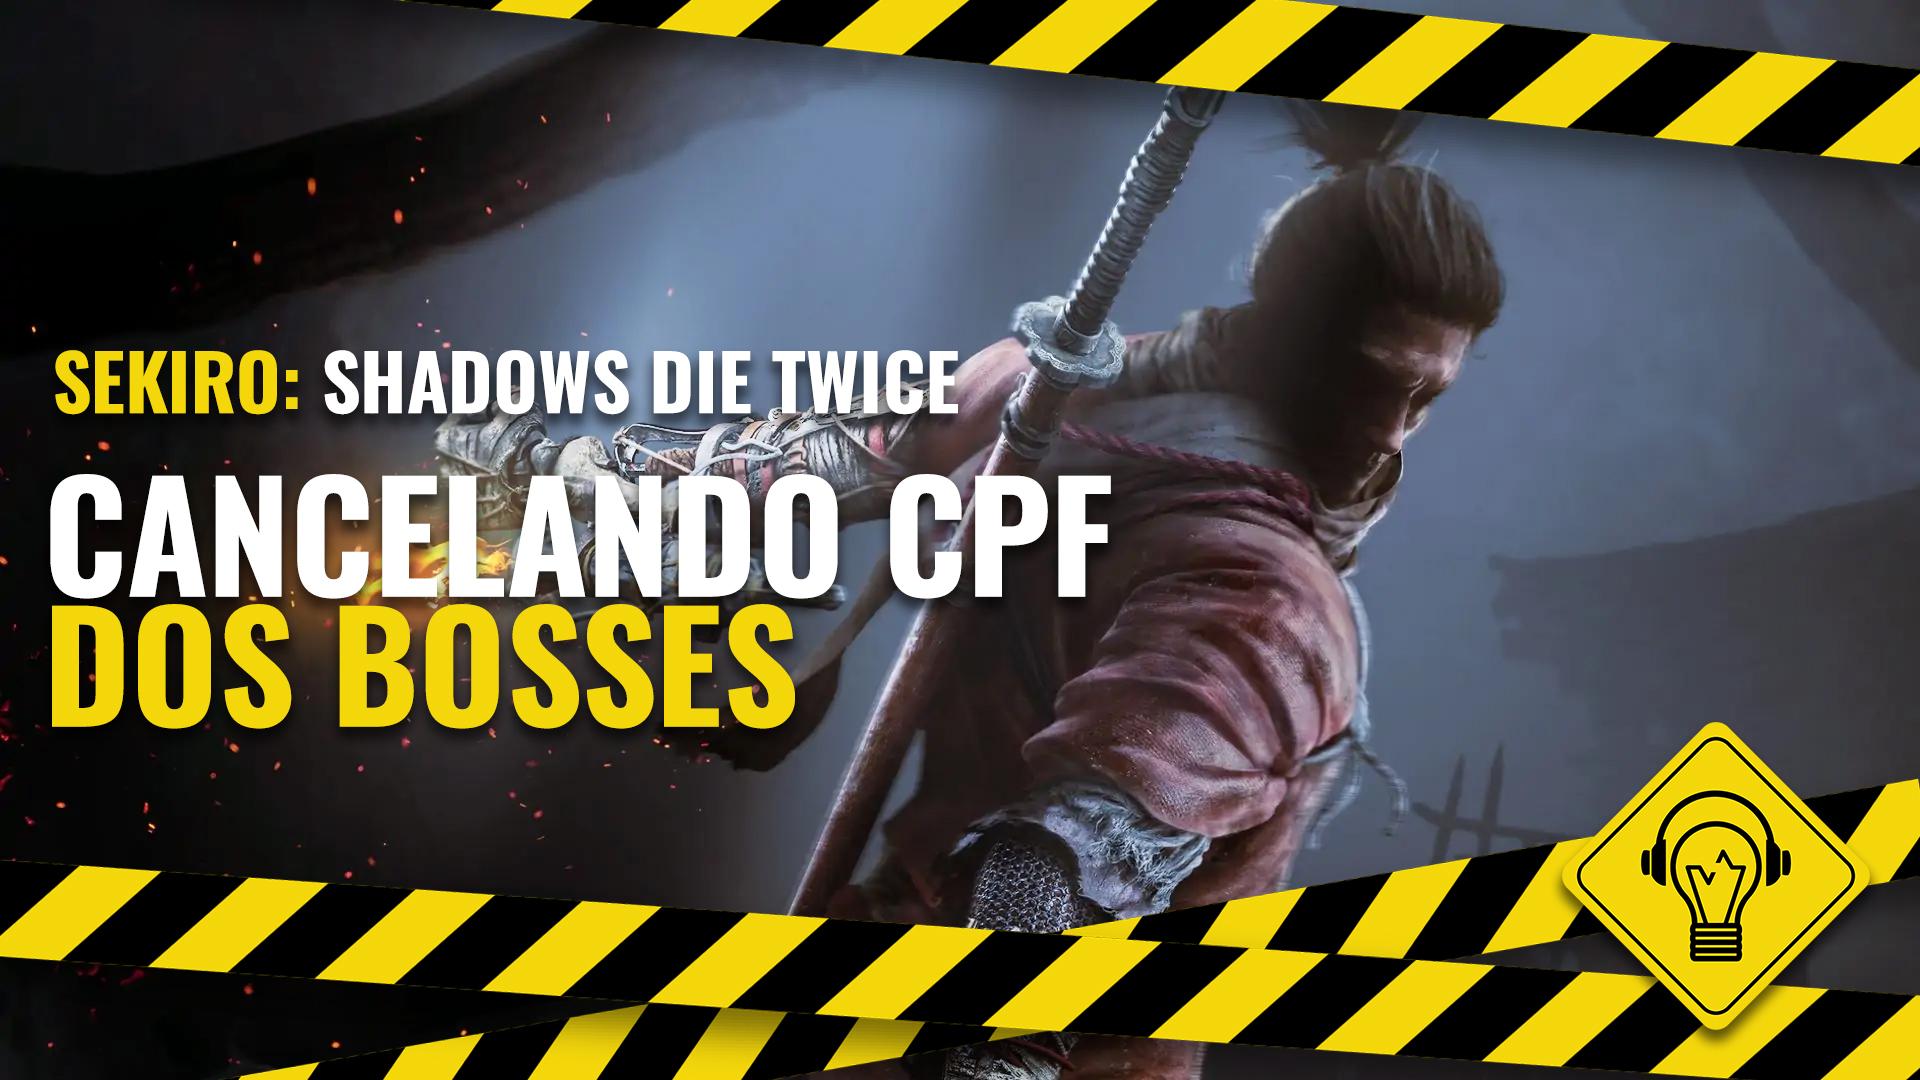 Jogando Errado – Cancelando CPF dos Bosses (Sekiro: Shadows Die Twice)